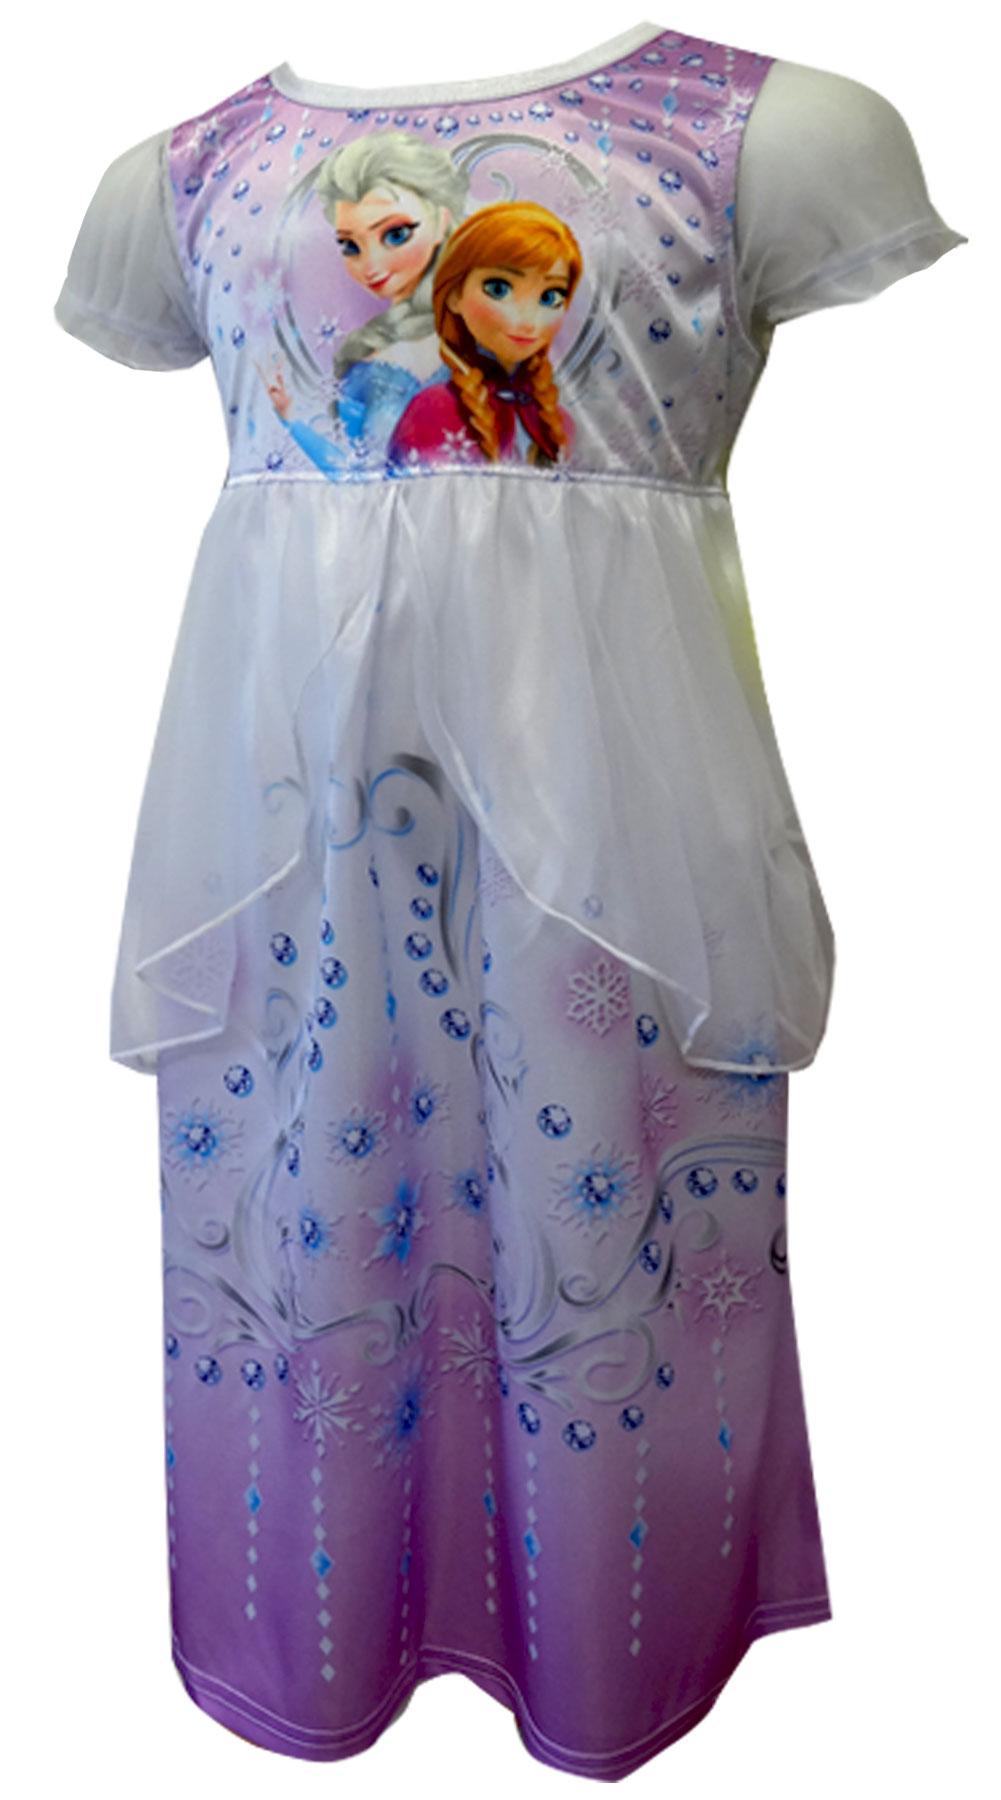 Disney Girls Moana Nightgown, Gown Sizes 2T-10 - Walmart.com